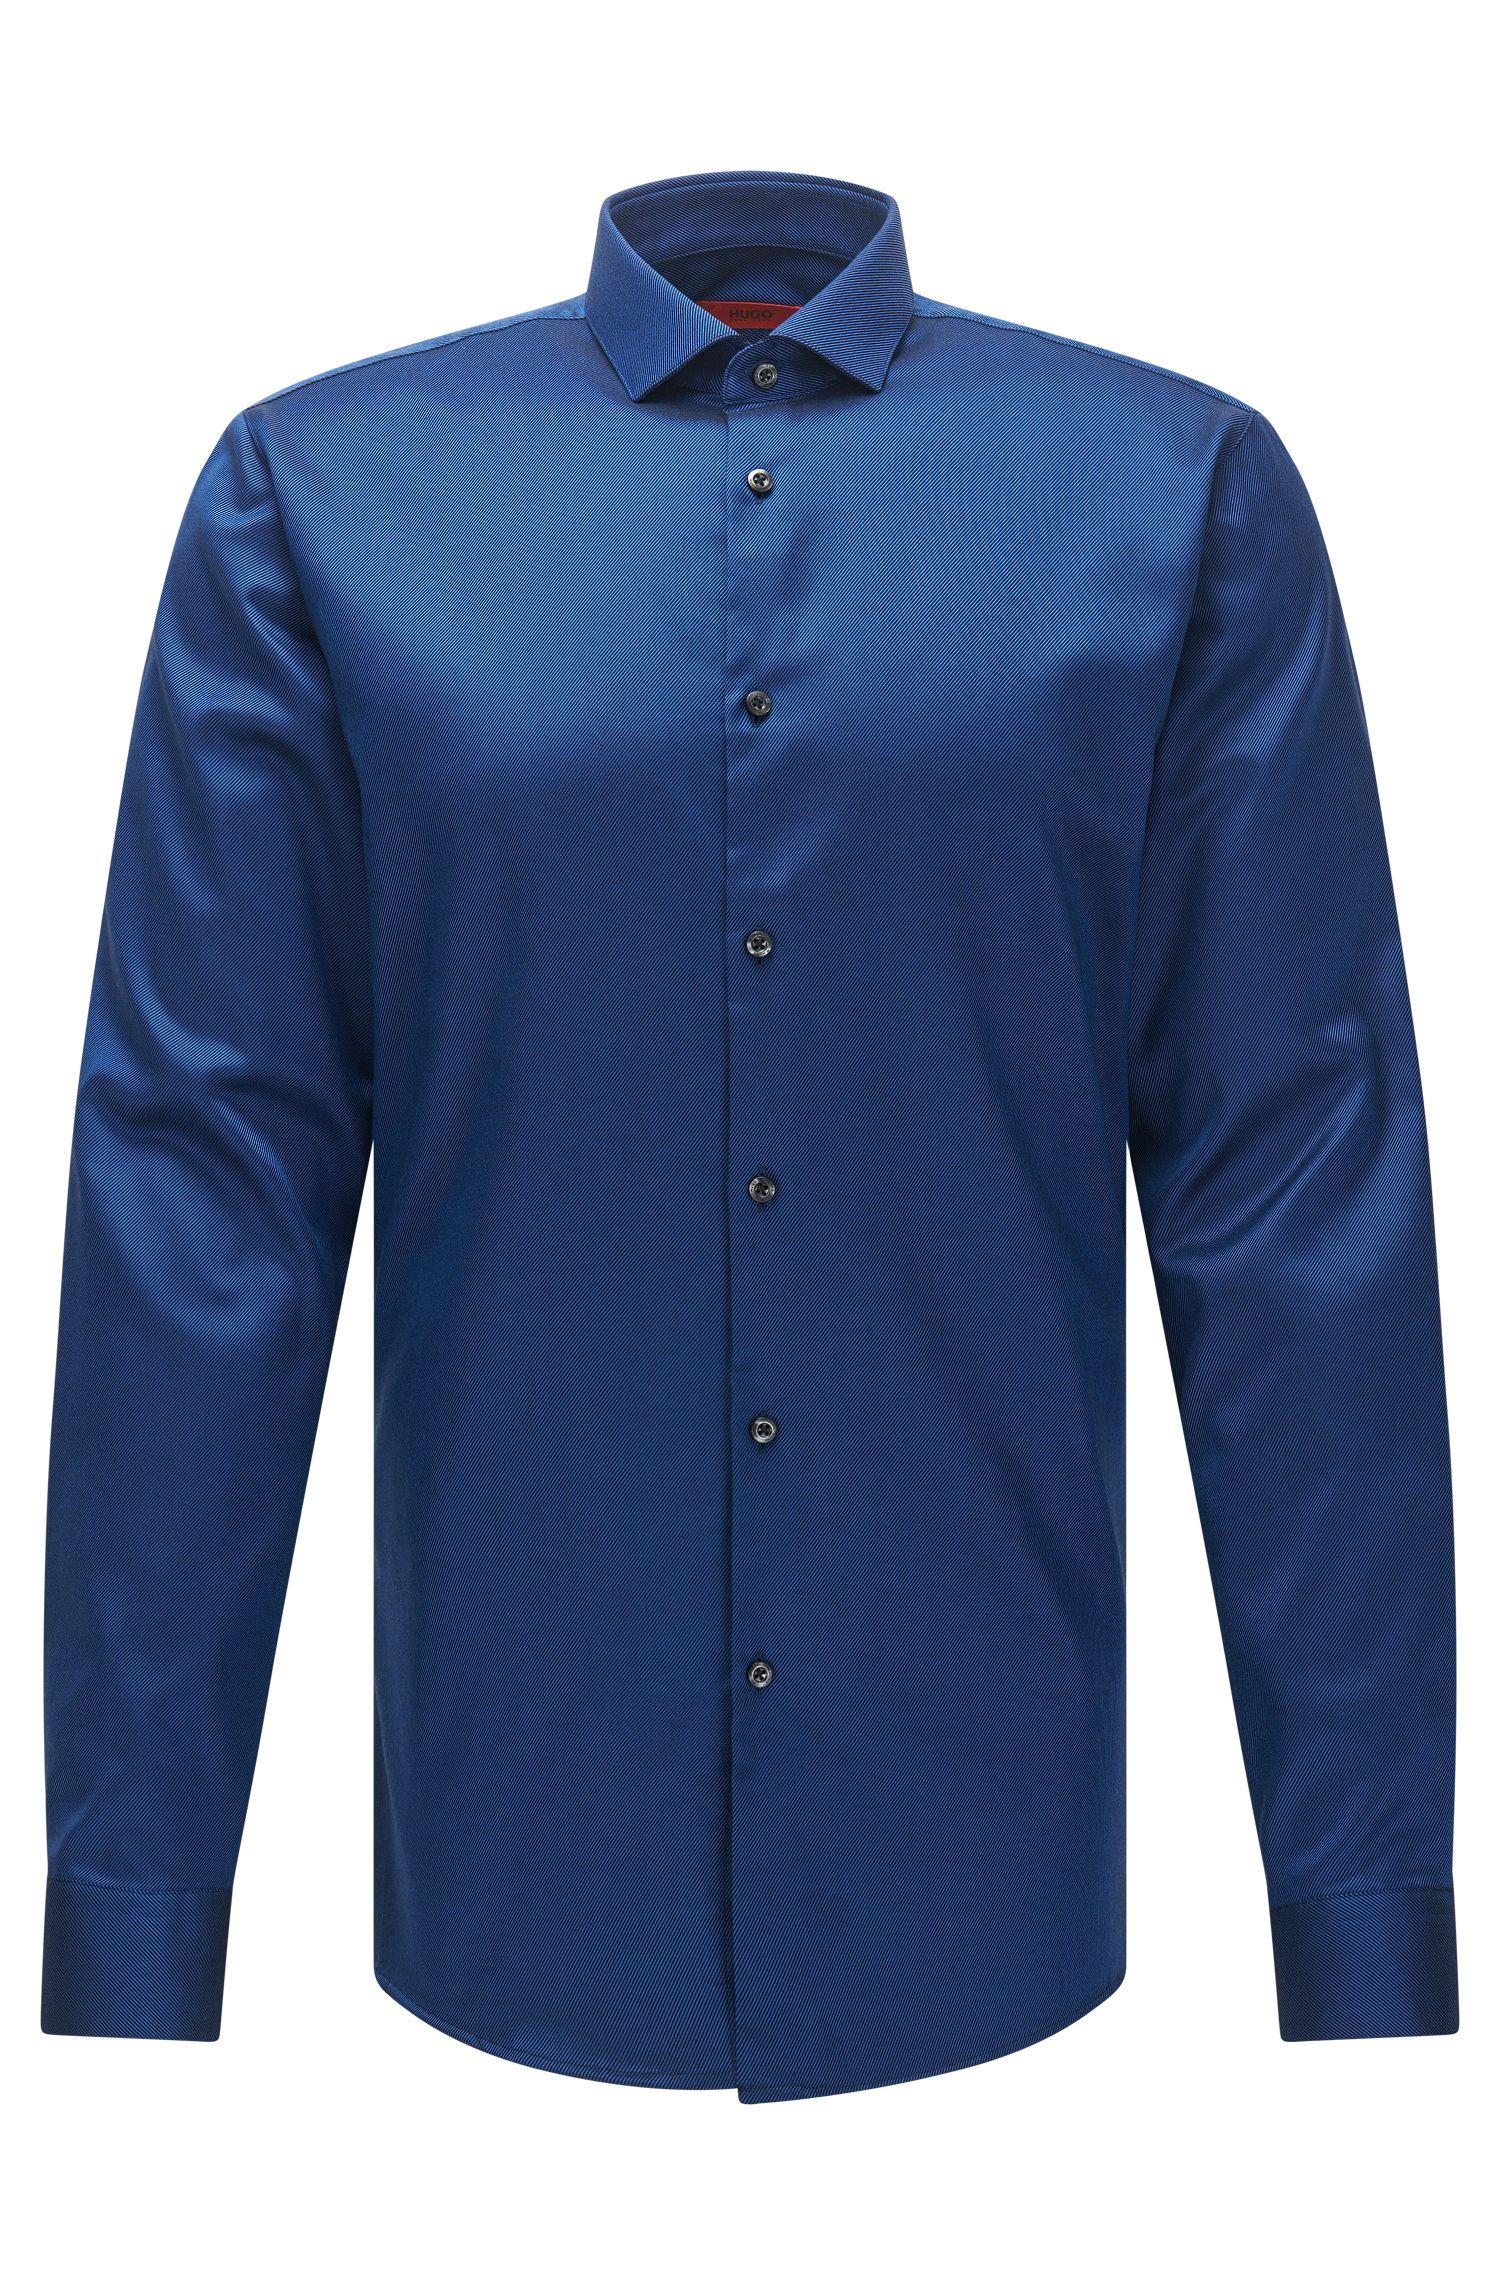 Easy-Iron Twill Cotton Dress Shirt, Extra-Slim Fit | Erondo